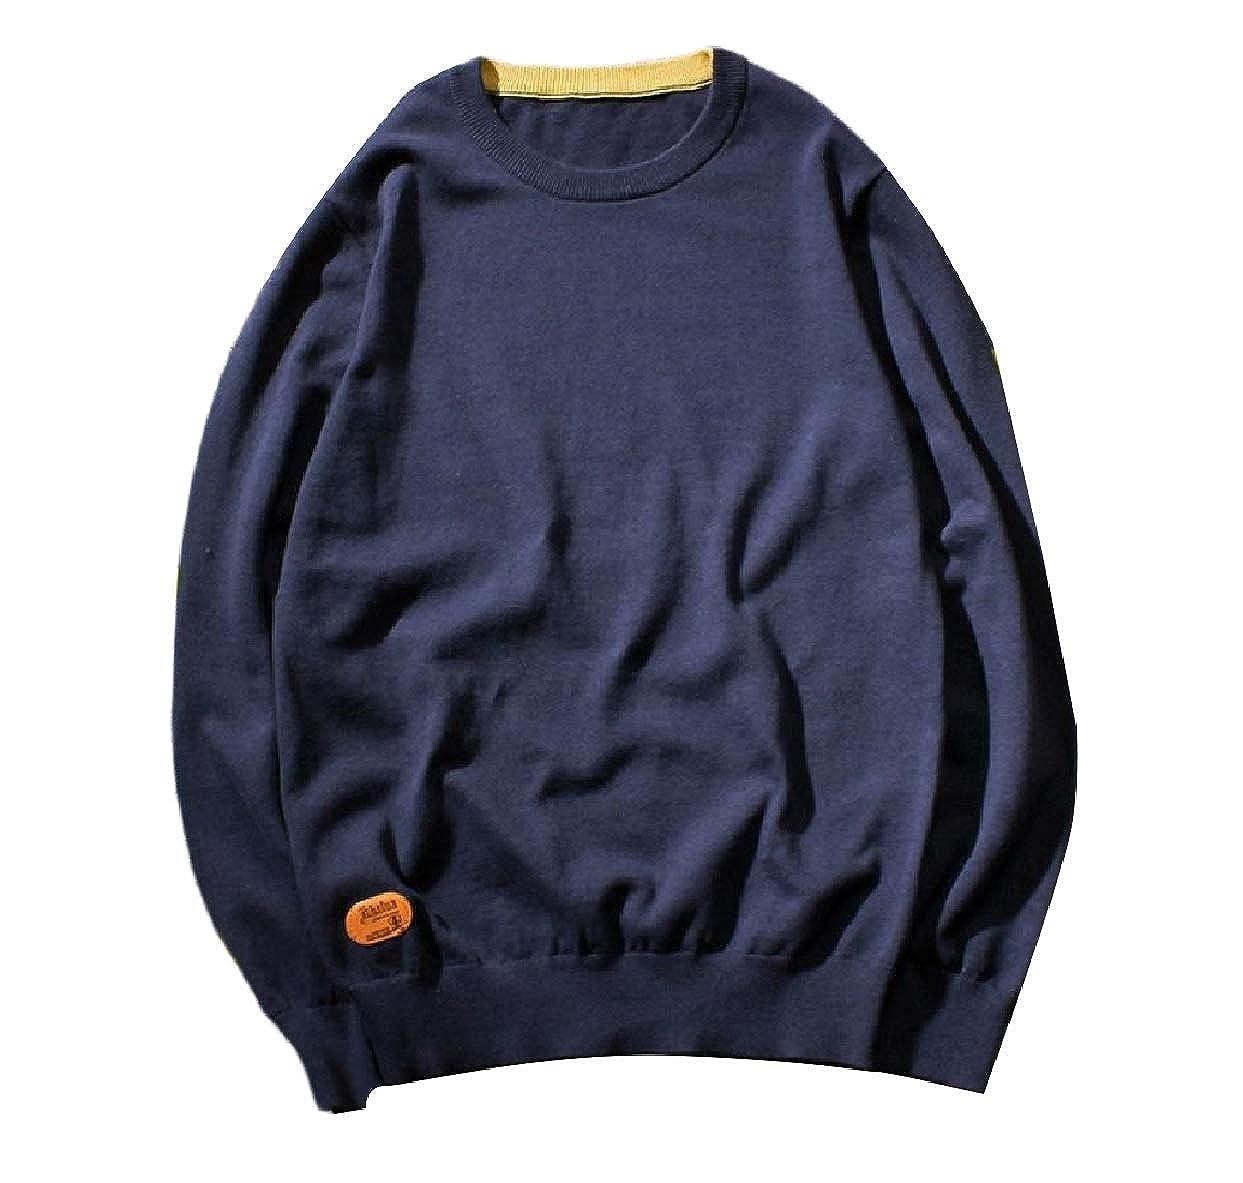 Zimaes-Men Regular Crewneck Oversized Loose-Fit Knitwear Sweater Jumper